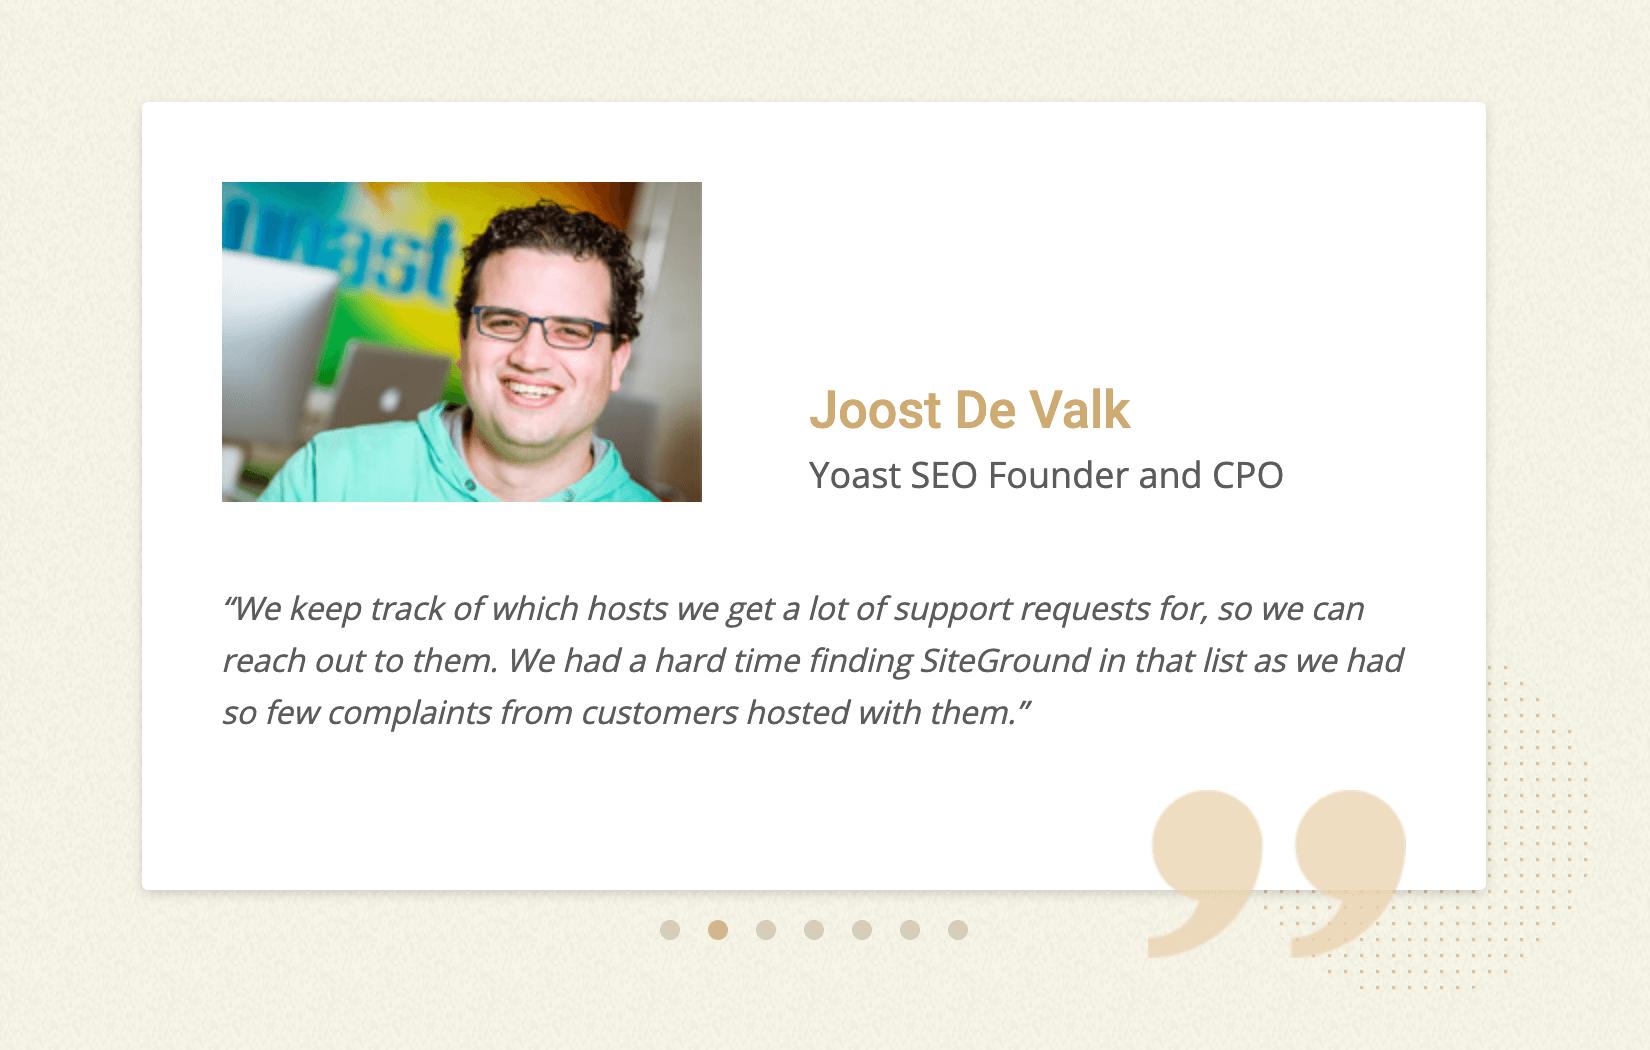 Joost De Valk – Founder and CPO of Yoast SEO